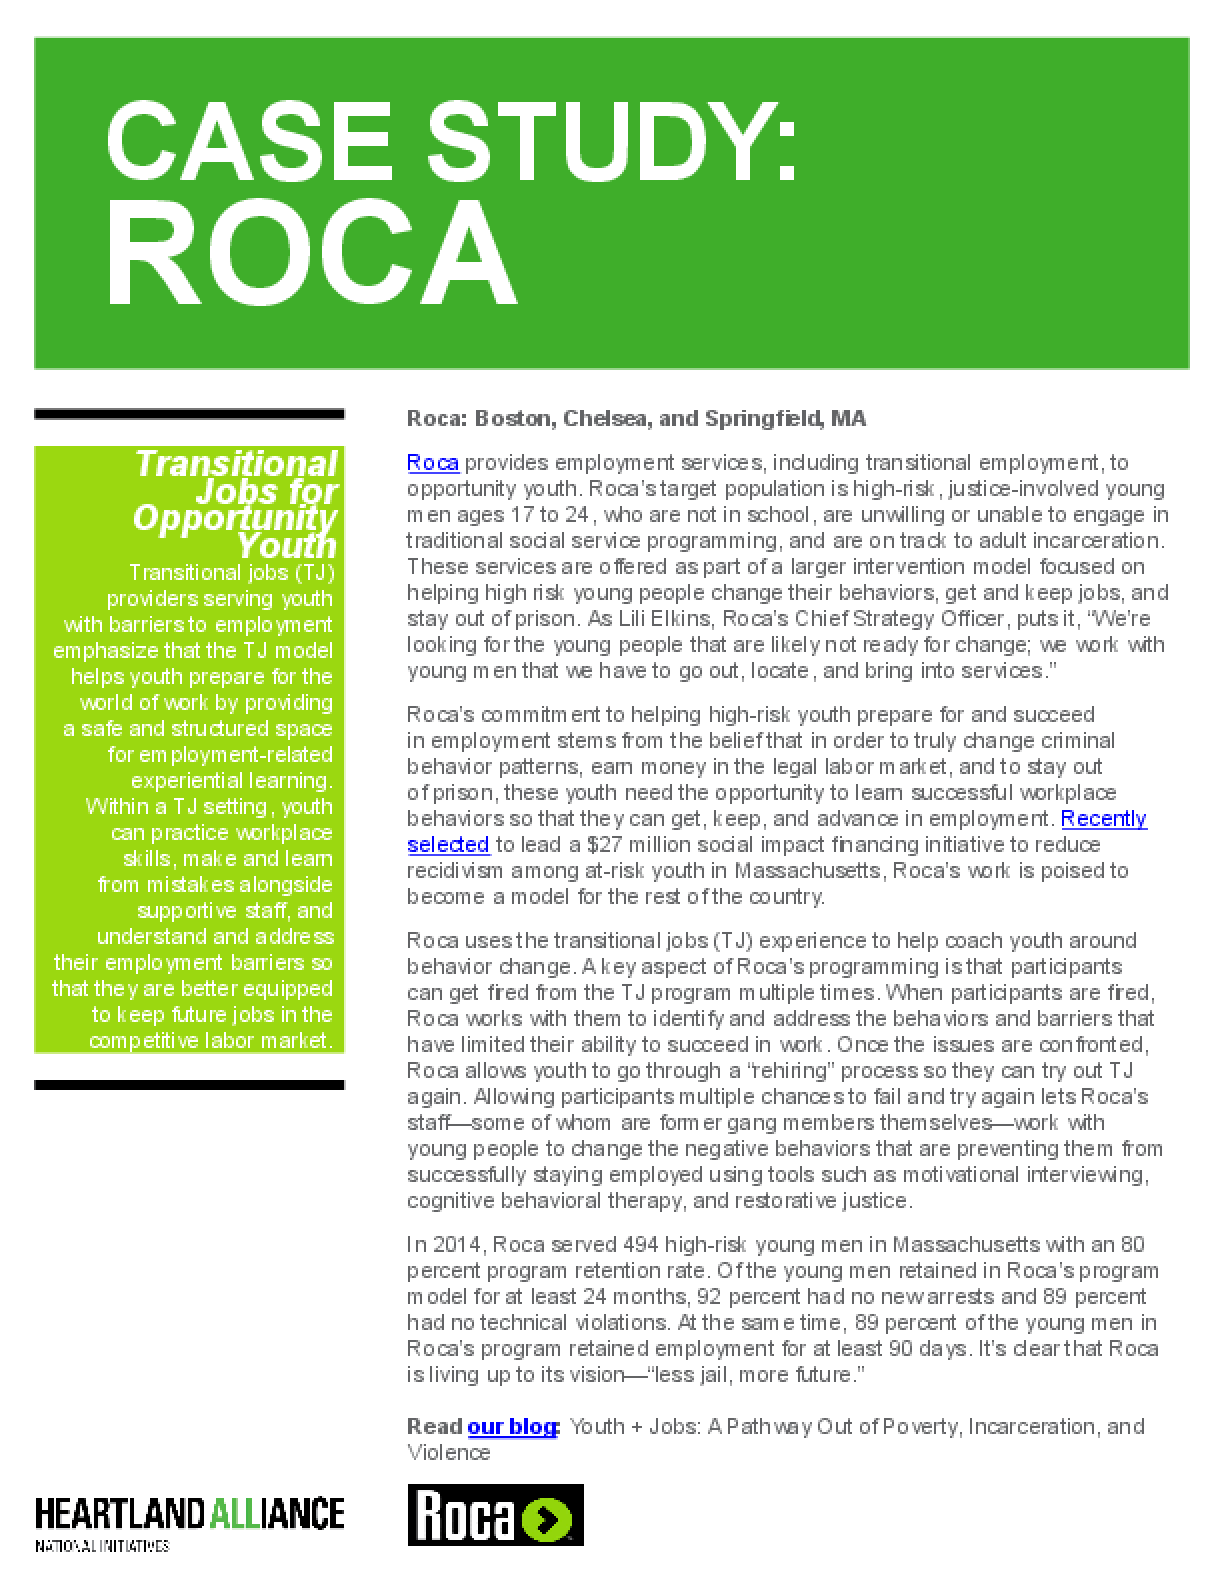 Opportunity Youth Employment Program Case Study: Roca